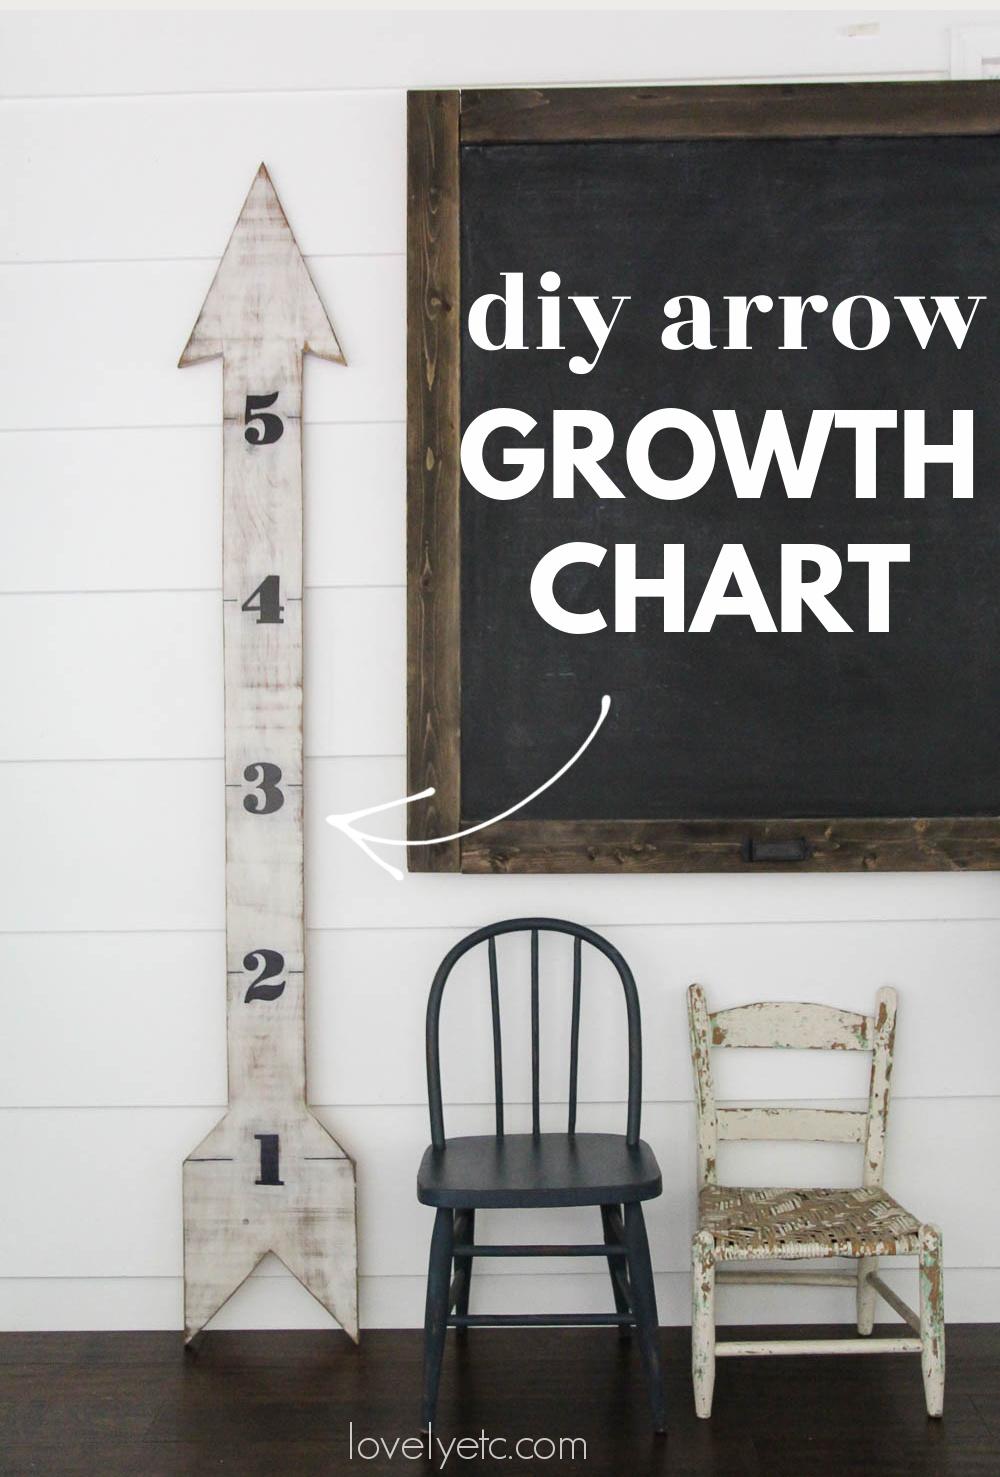 diy arrow growth chart next to large chalkboard.